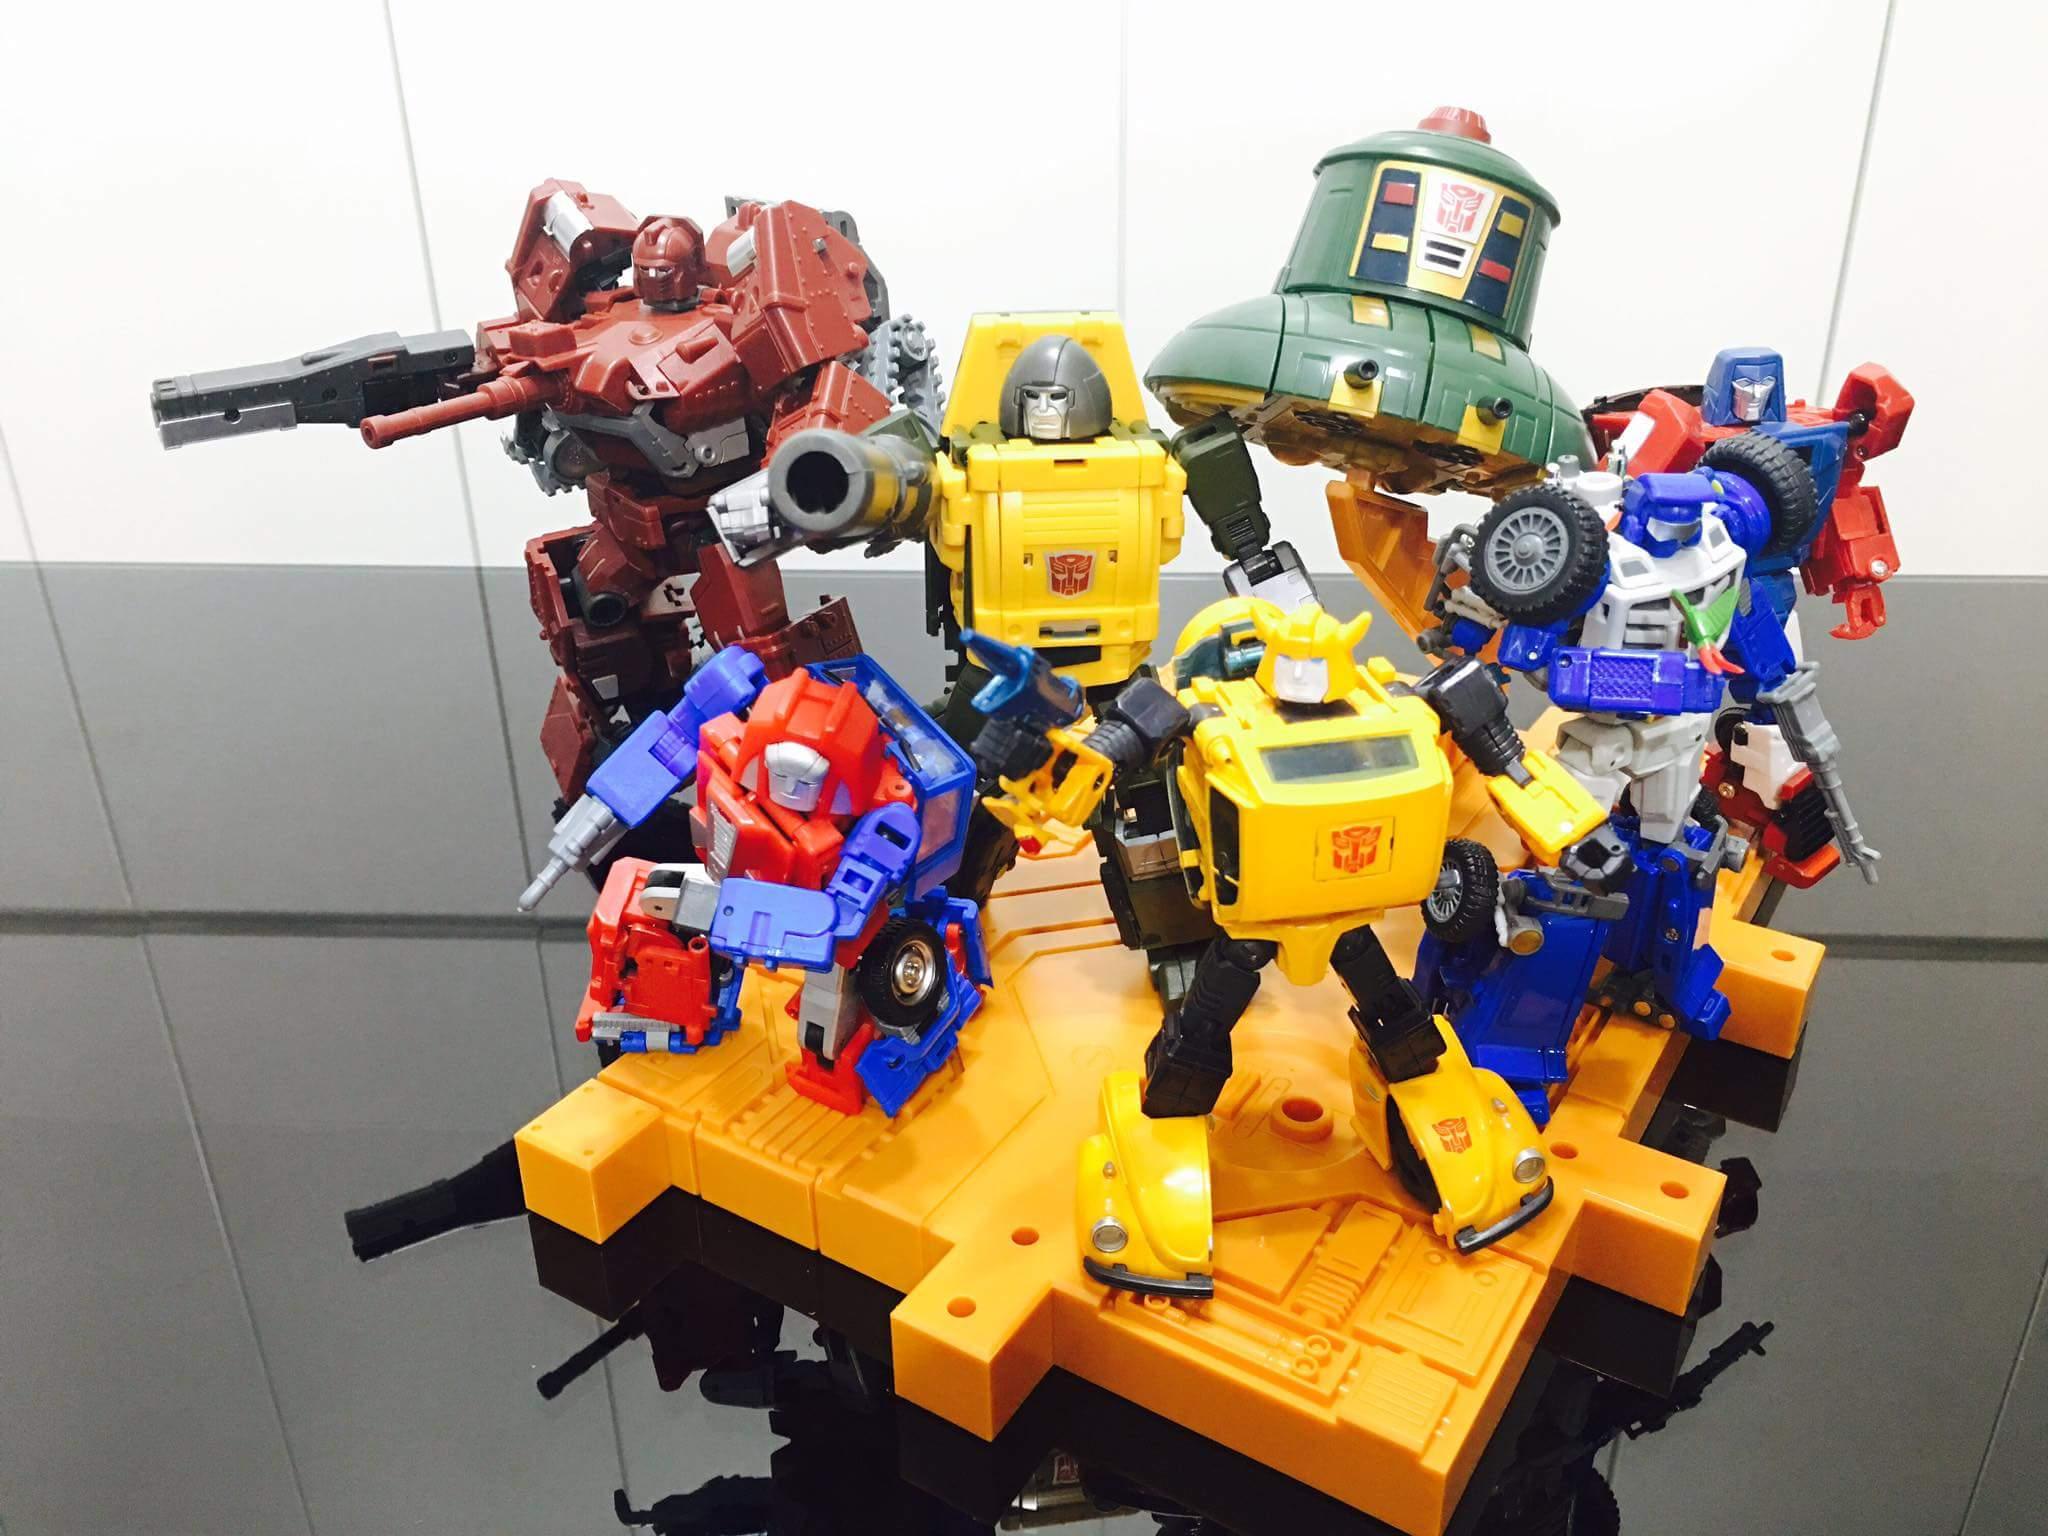 [Toyworld][Zeta Toys] Produit Tiers - Minibots MP - Gamme EX - Page 2 QECQlLMP